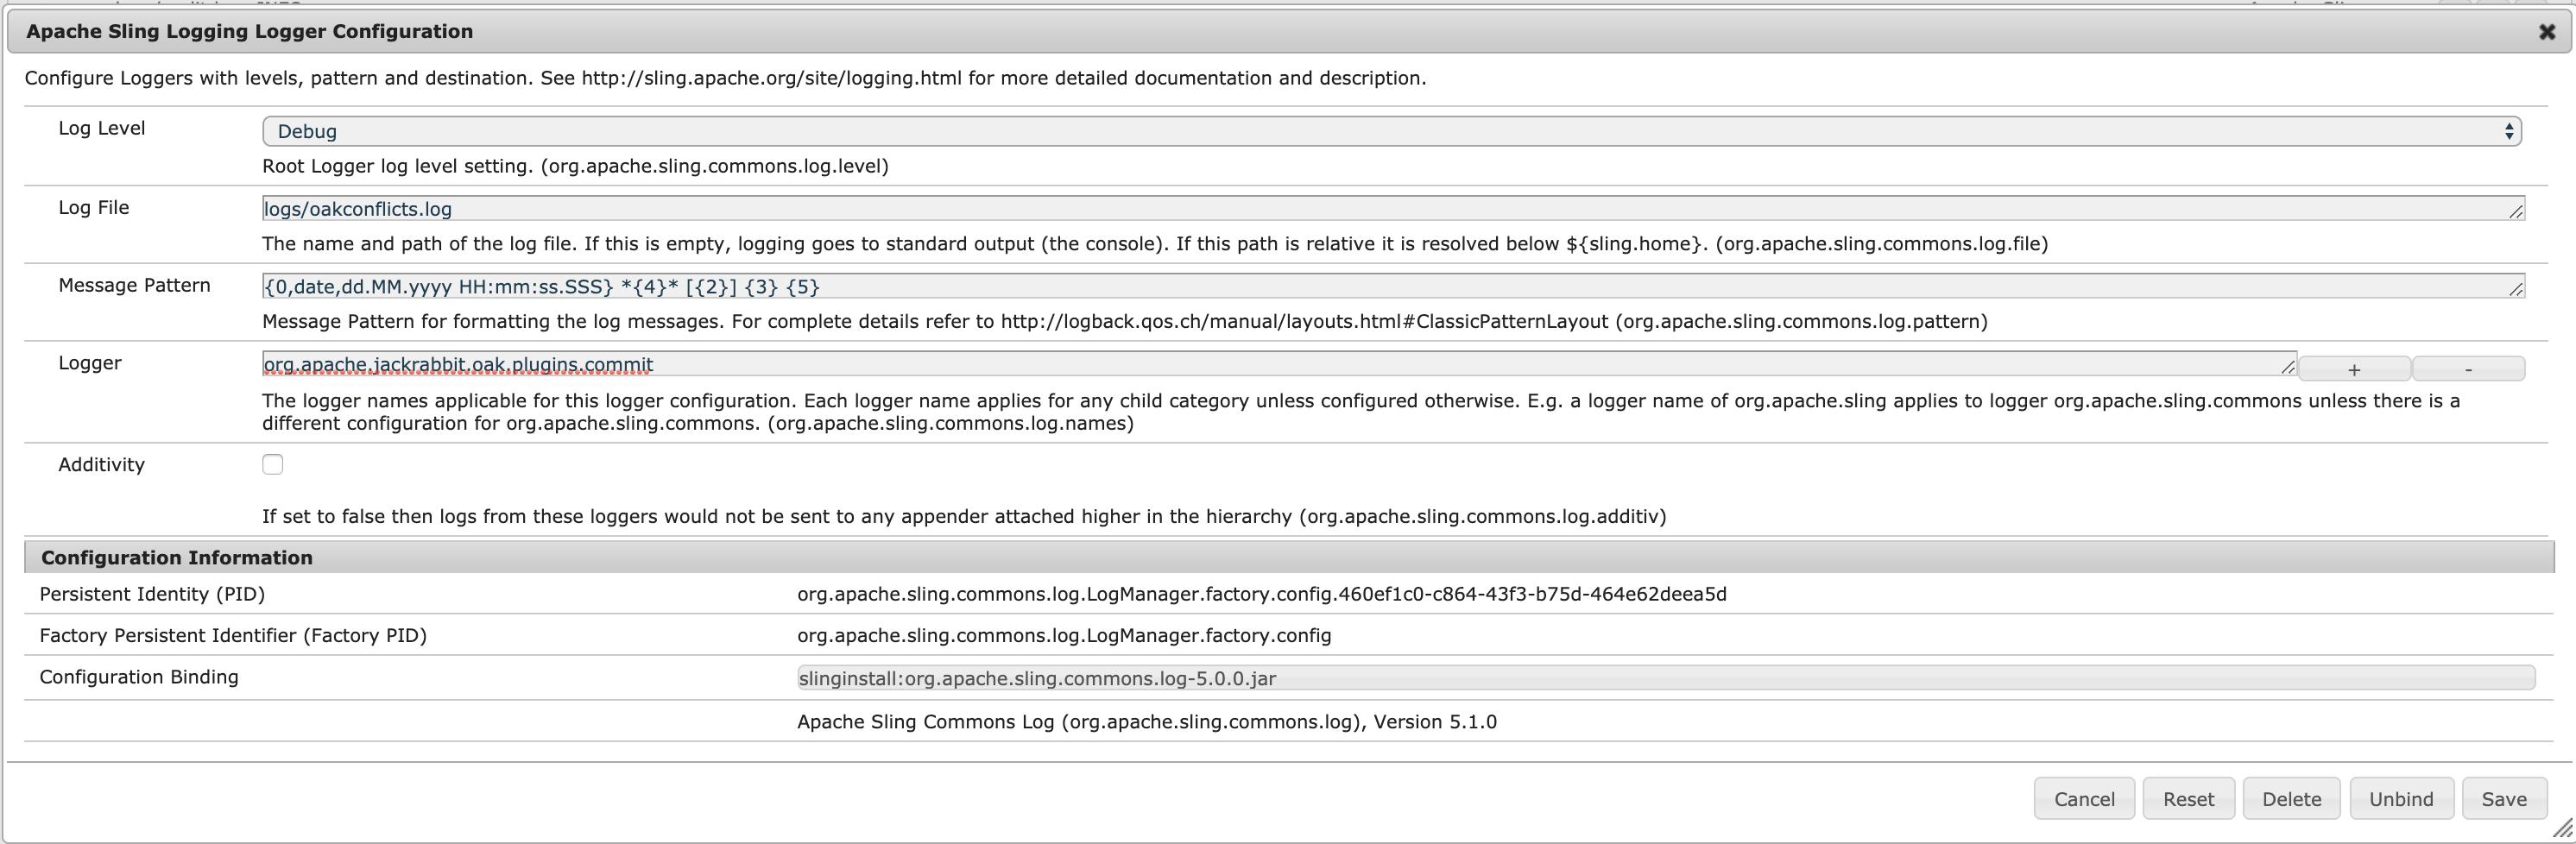 Apache Sling Logging Logger Configurations